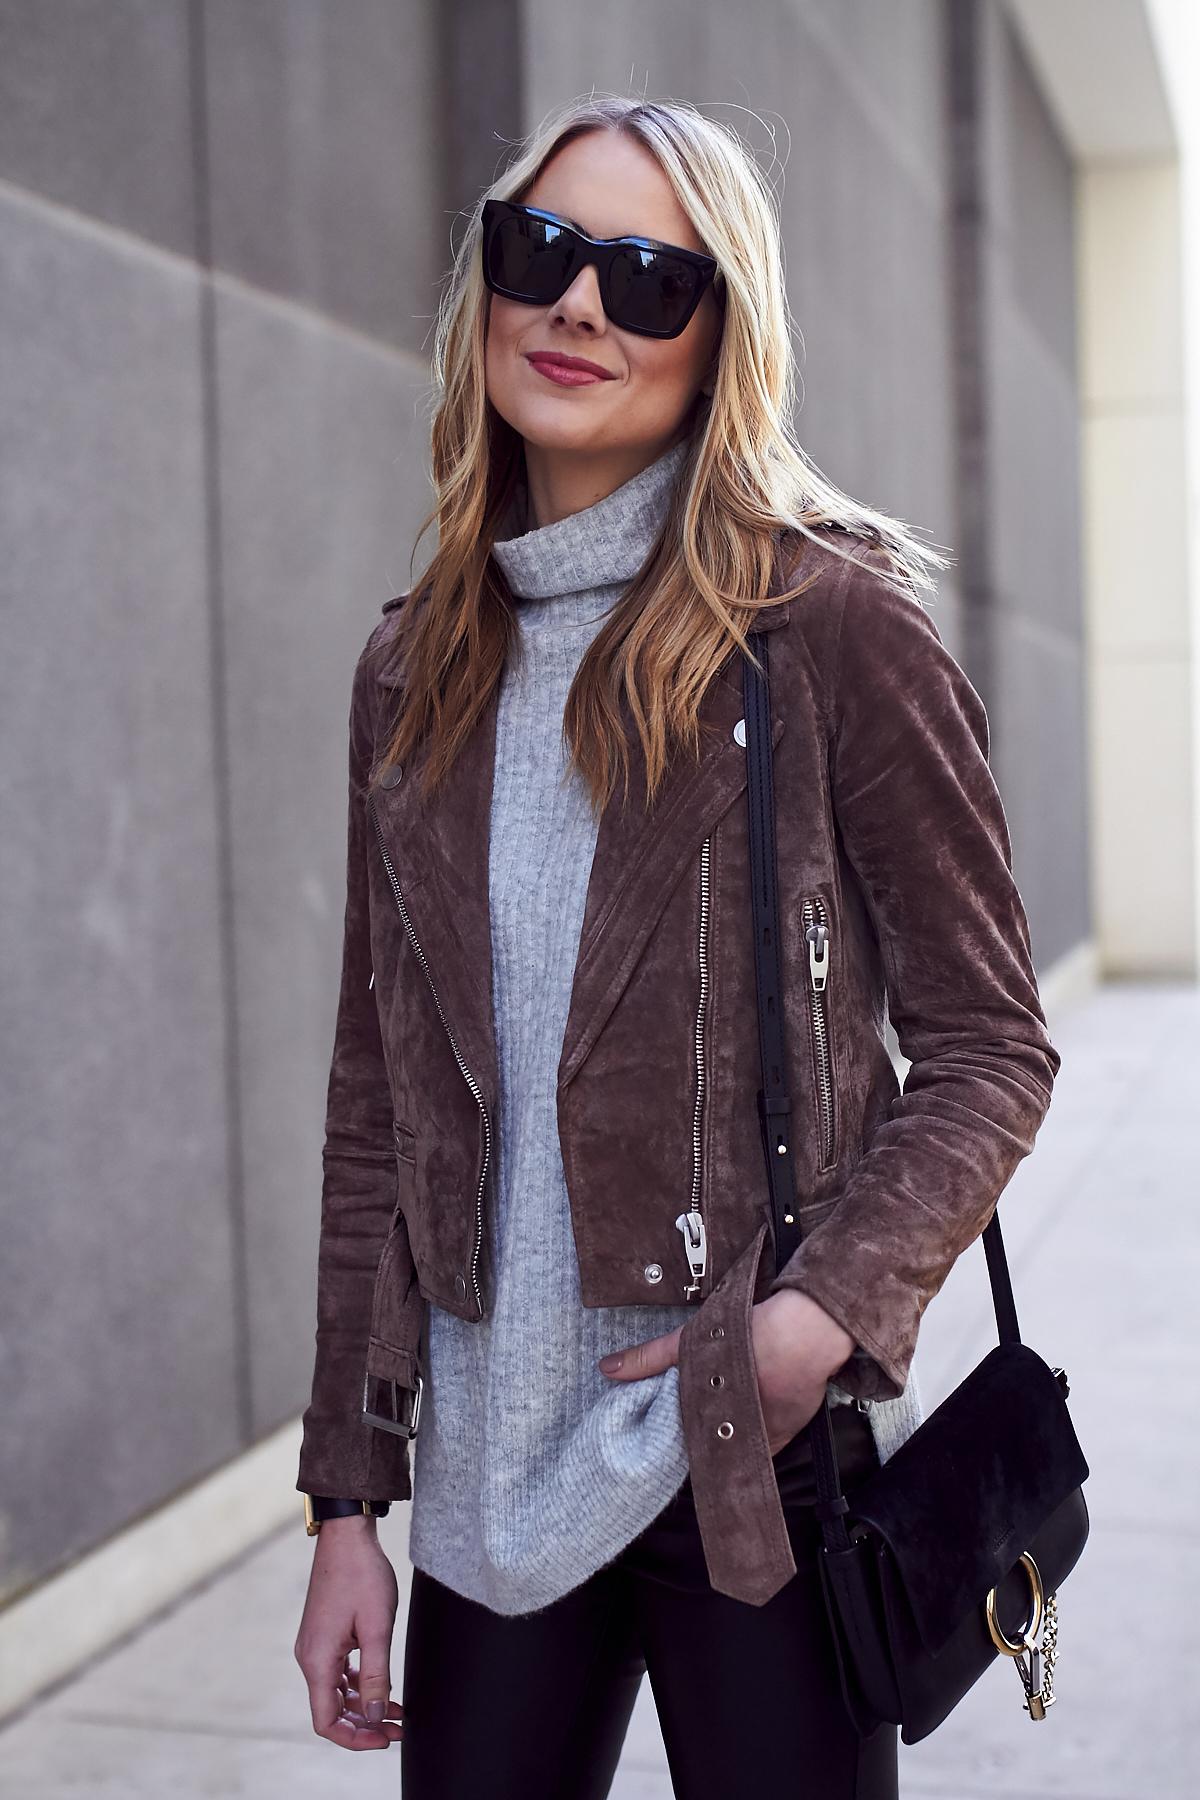 Fall Outfit, Brown Suede Moto Jacket, Grey Sweater, Chloe Faye Handbag